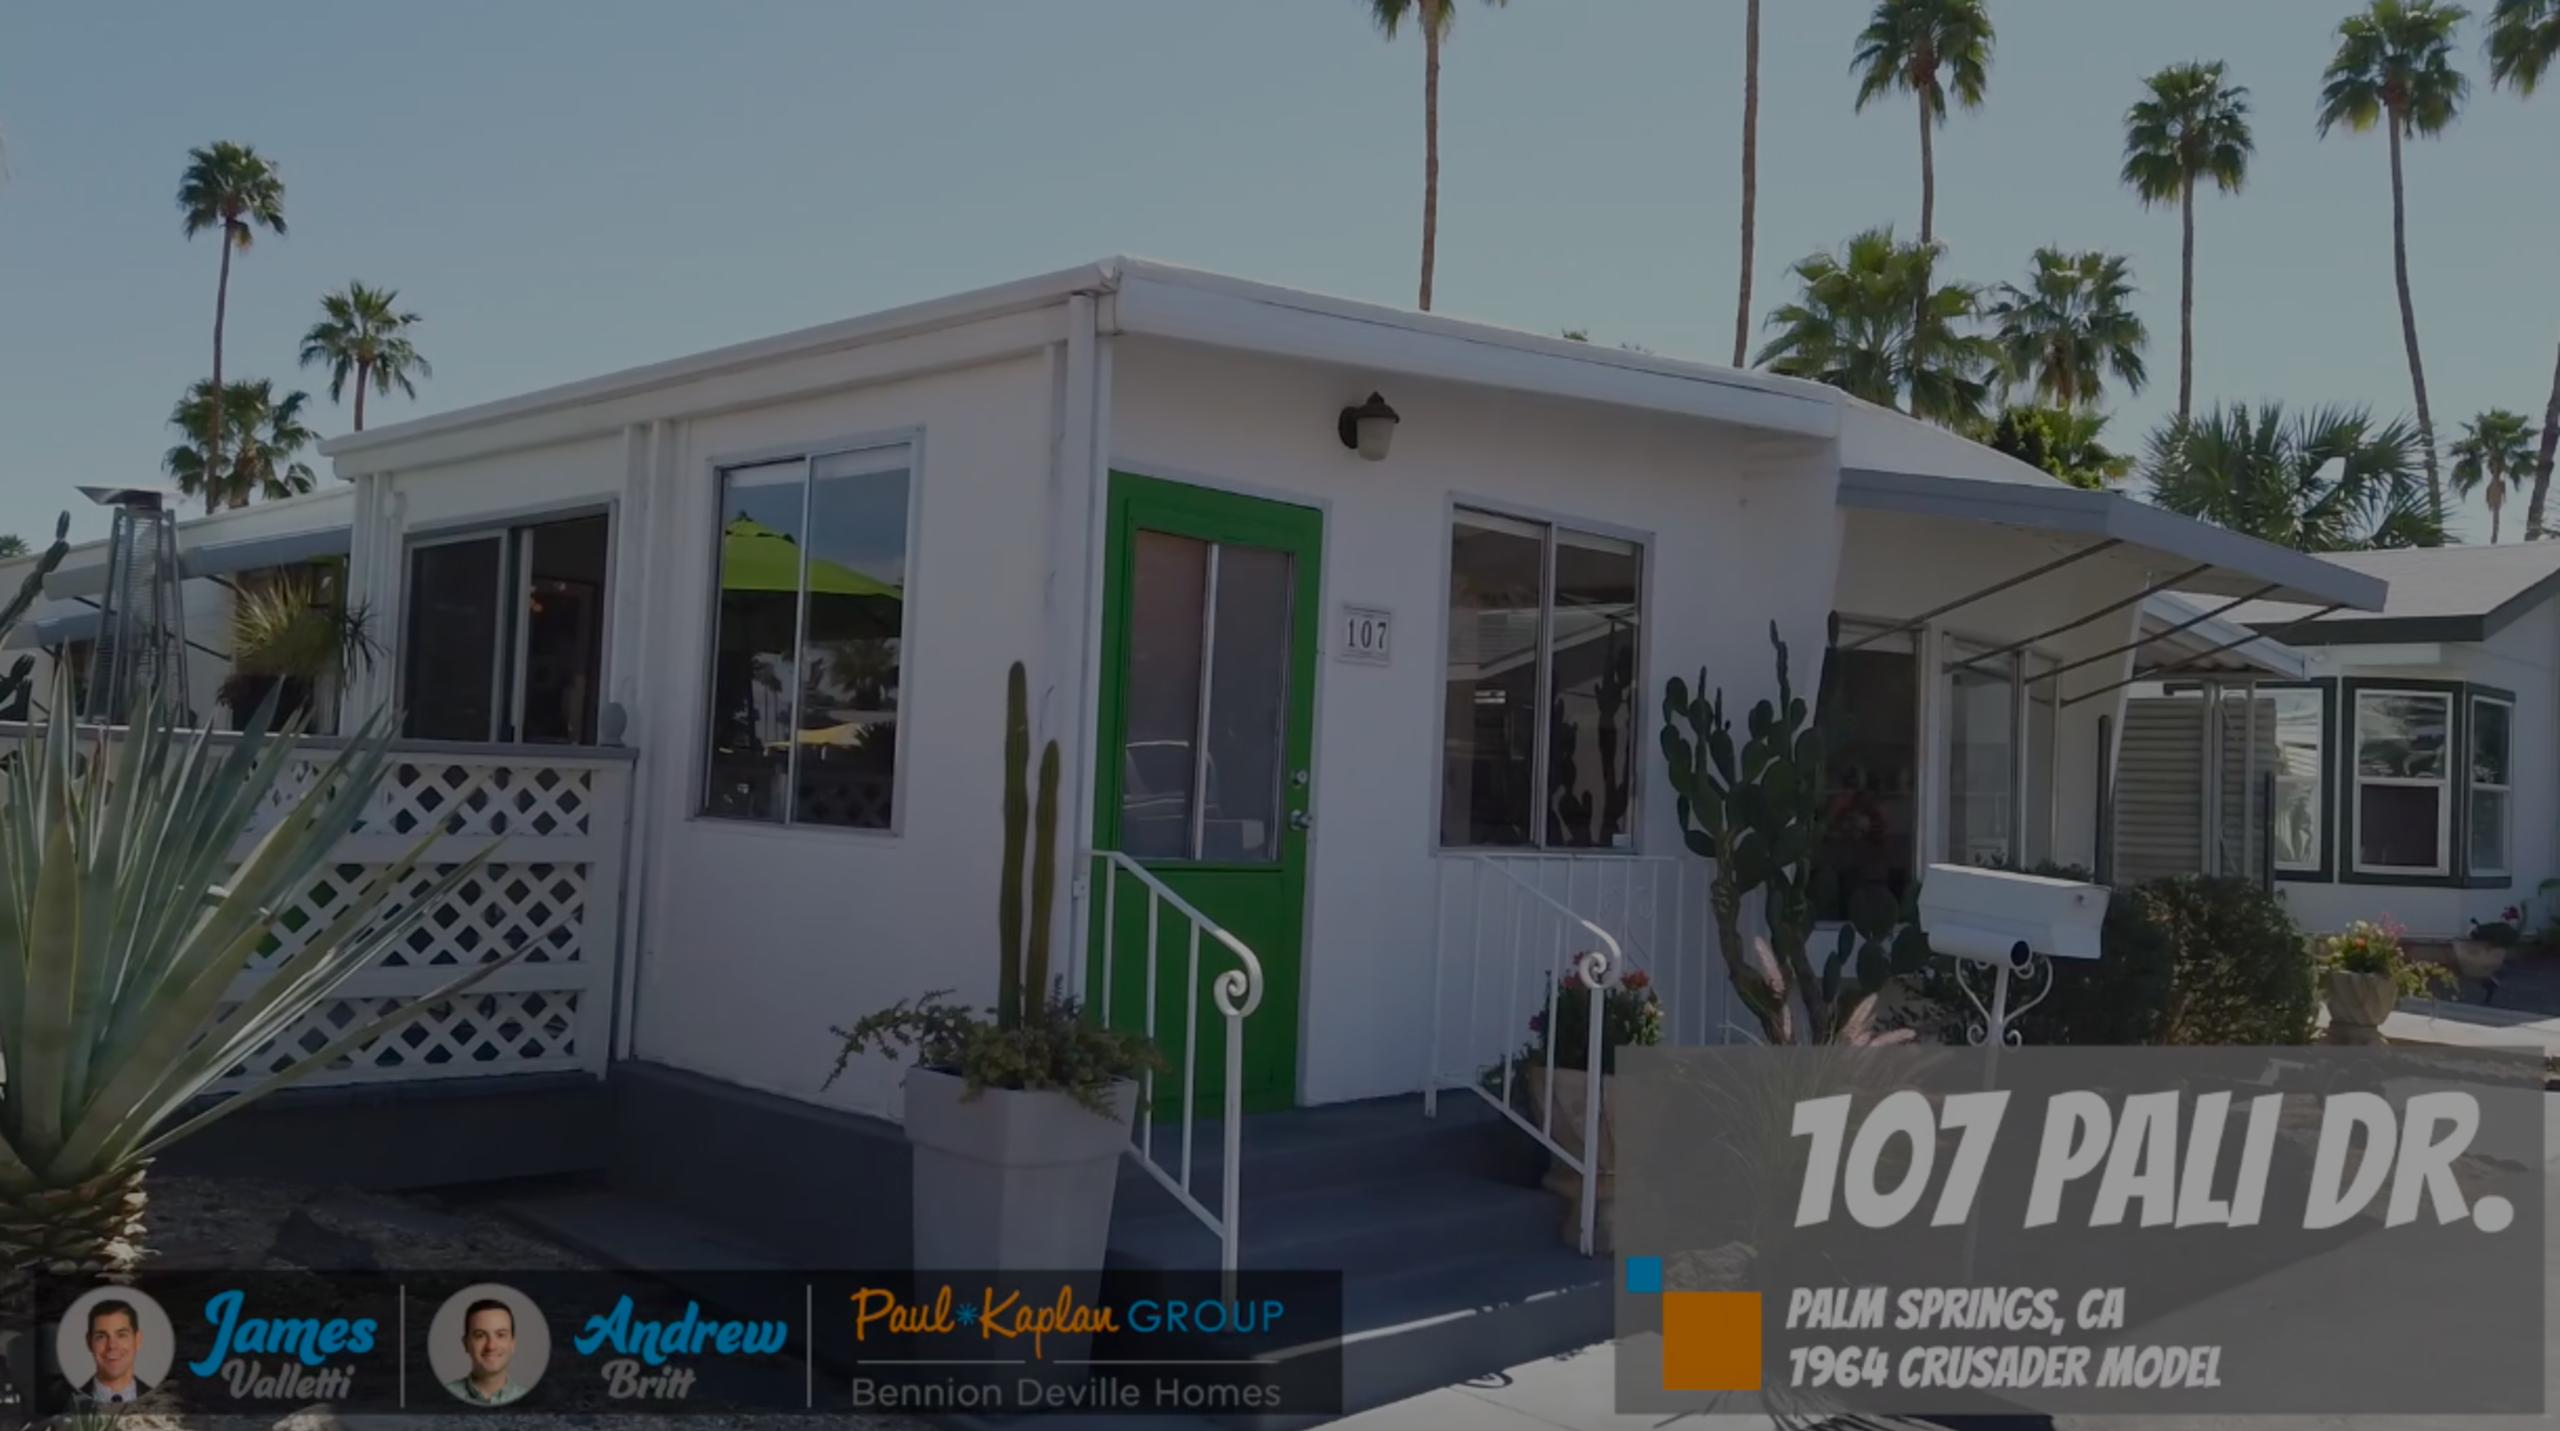 Charming Mobile Home Listing – 107 Pali Dr, Palm Springs